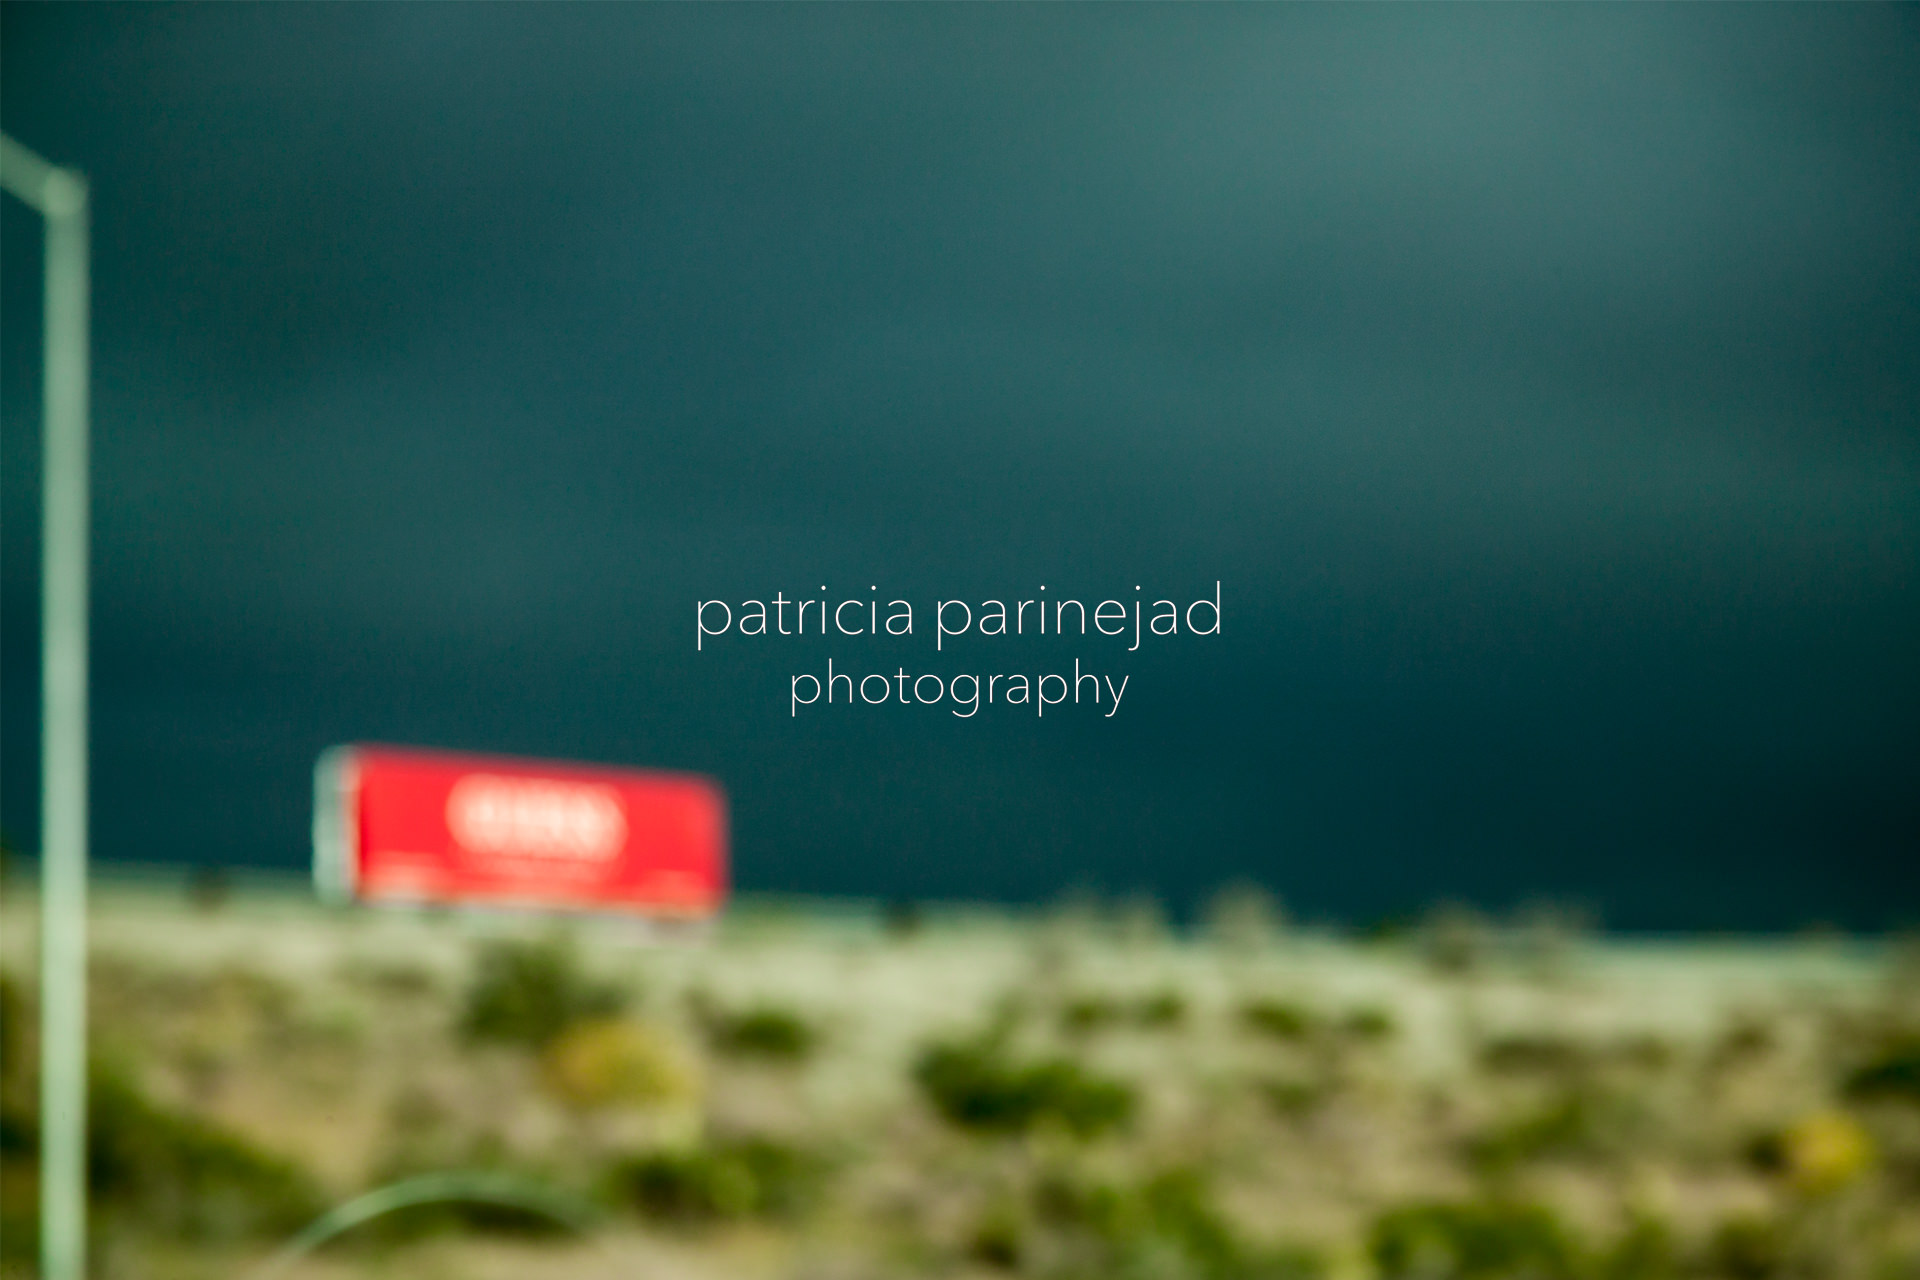 Patricia Parinejad